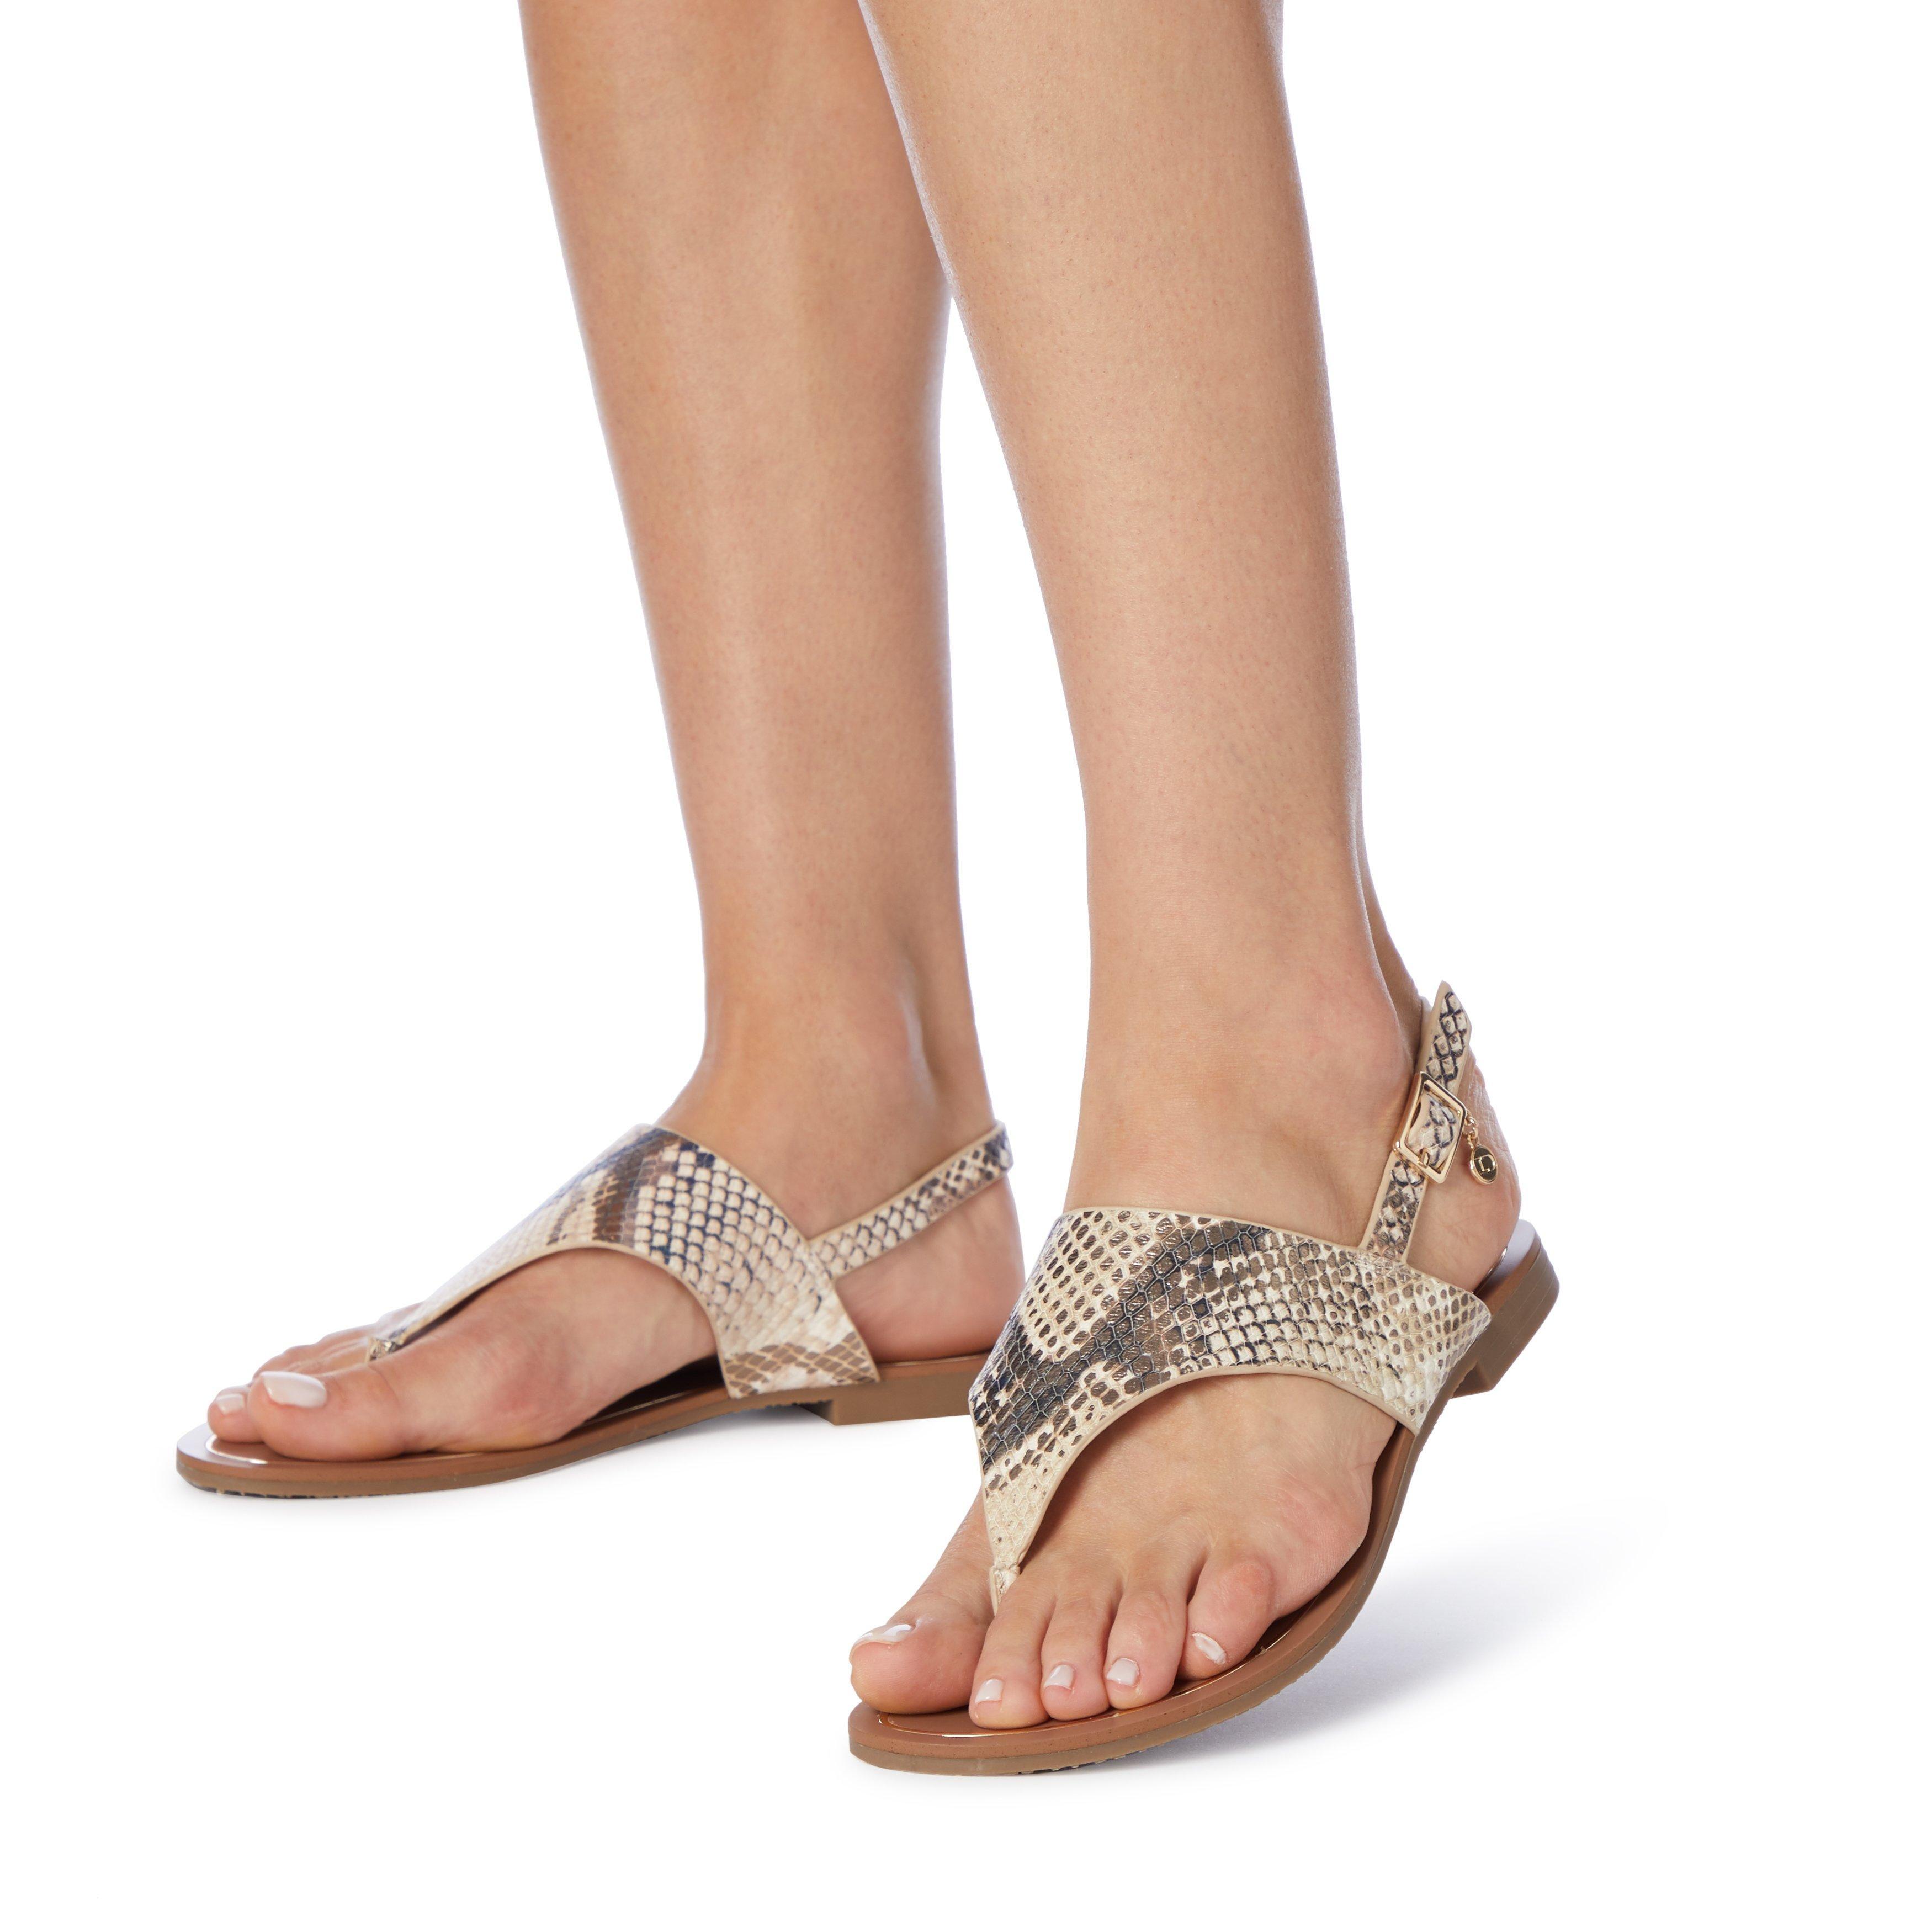 Dune Ladies LADLEY Leather Sandals